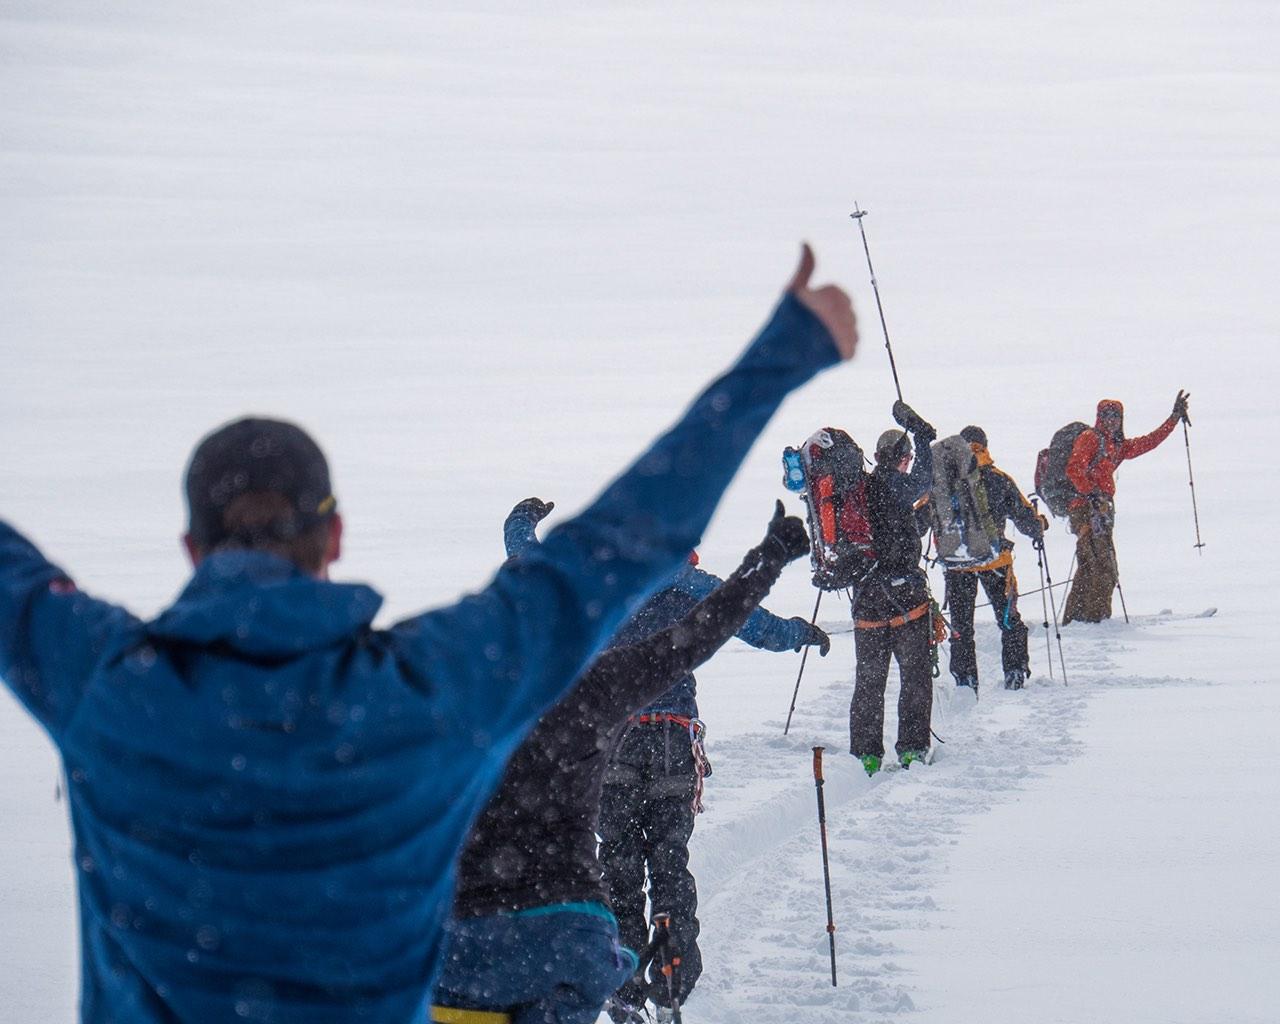 Whistler Backcountry Ski and Splitboard Tour